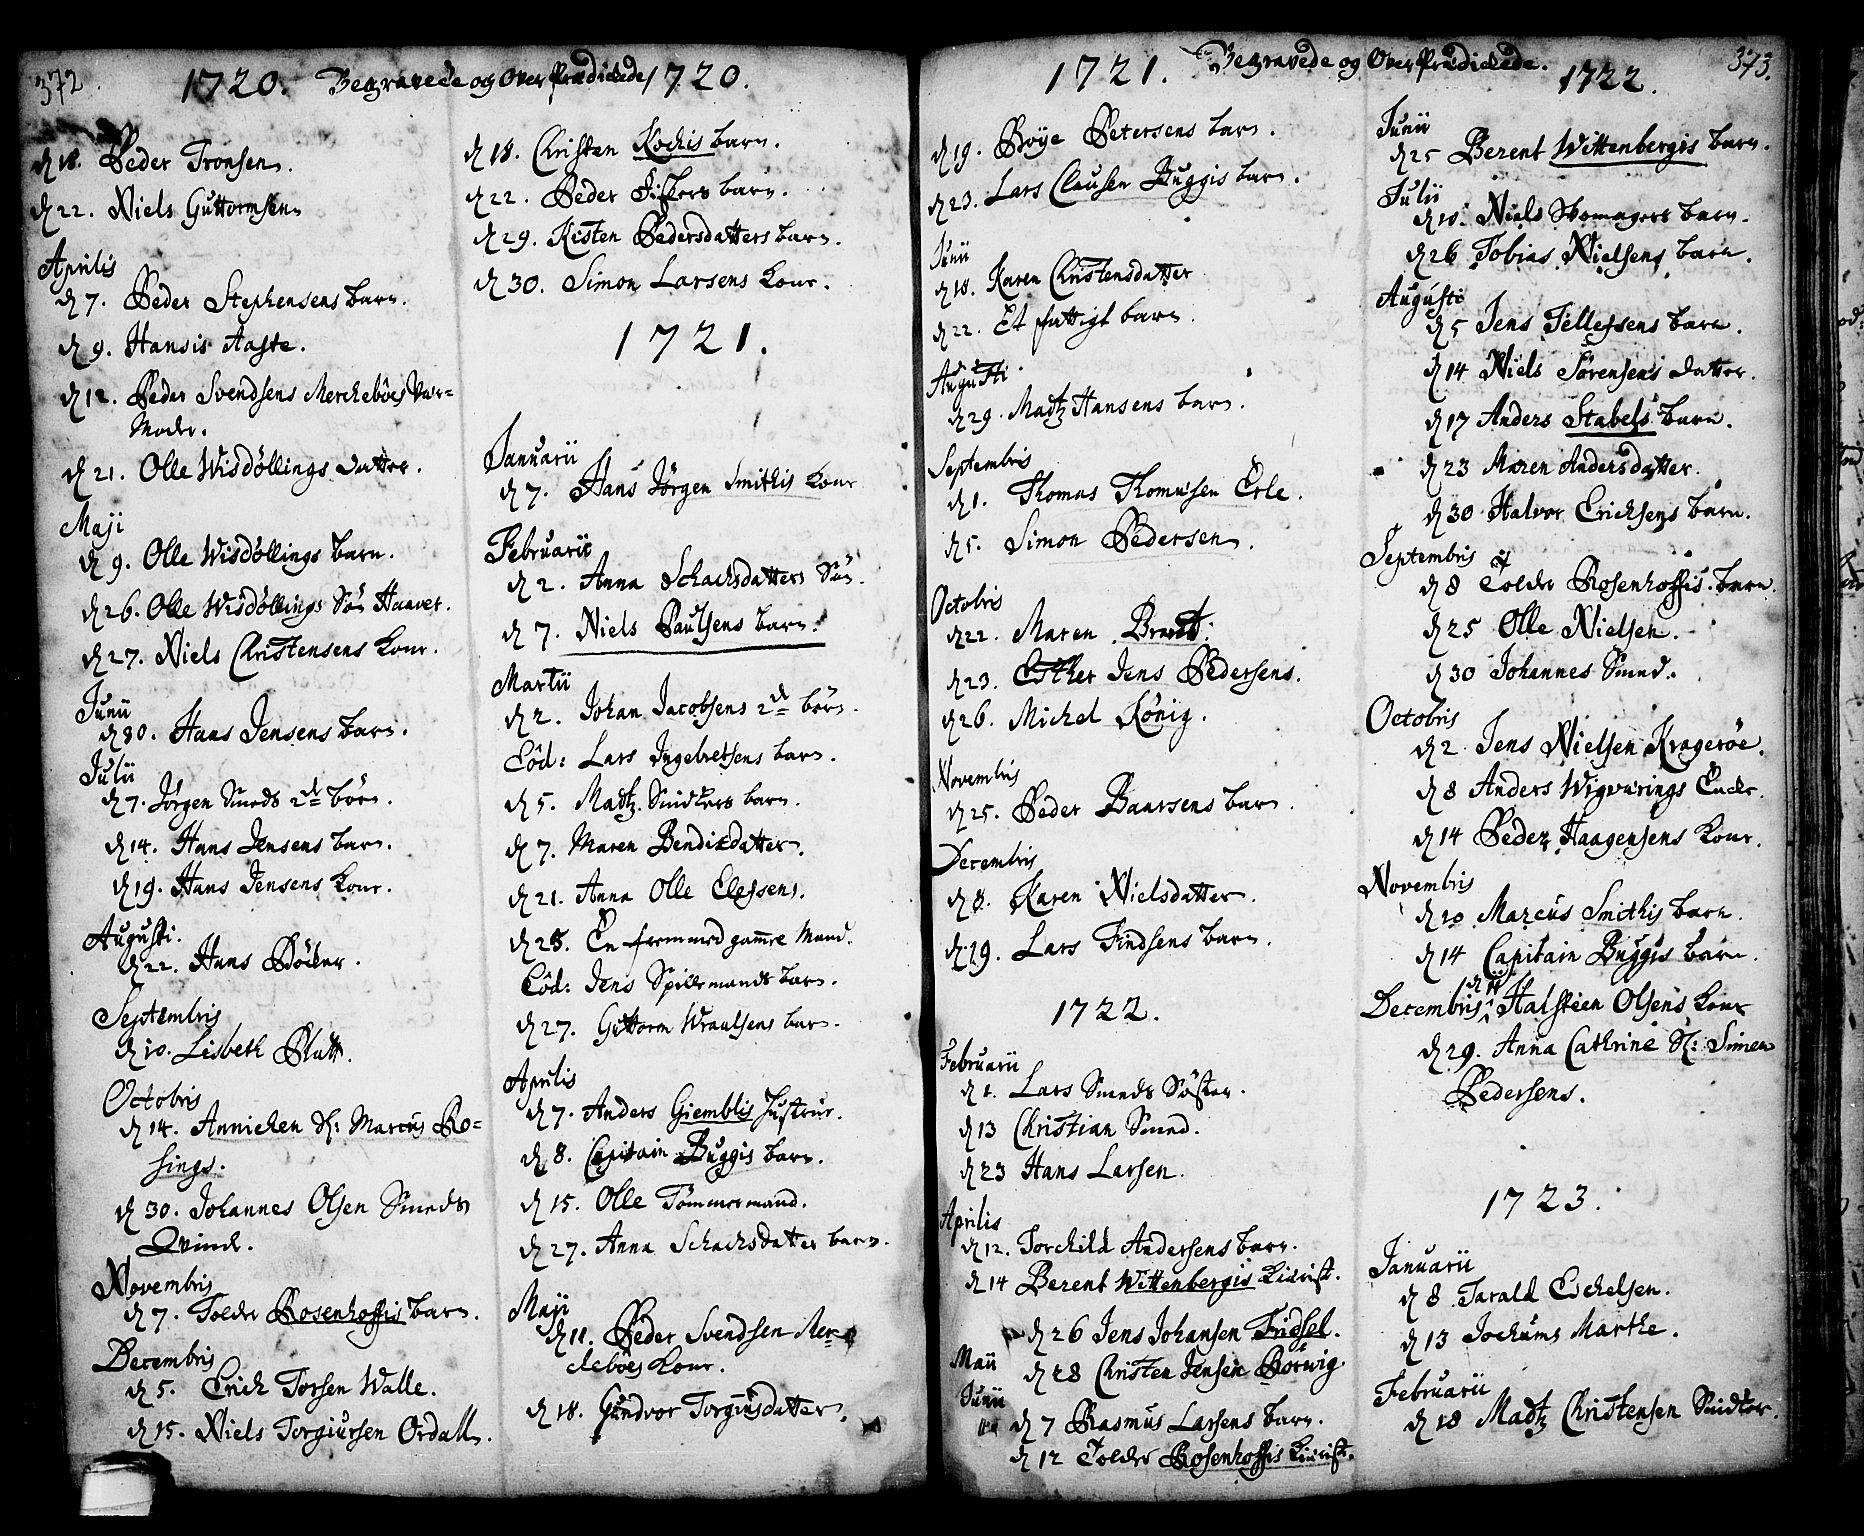 SAKO, Kragerø kirkebøker, F/Fa/L0001: Ministerialbok nr. 1, 1702-1766, s. 372-373